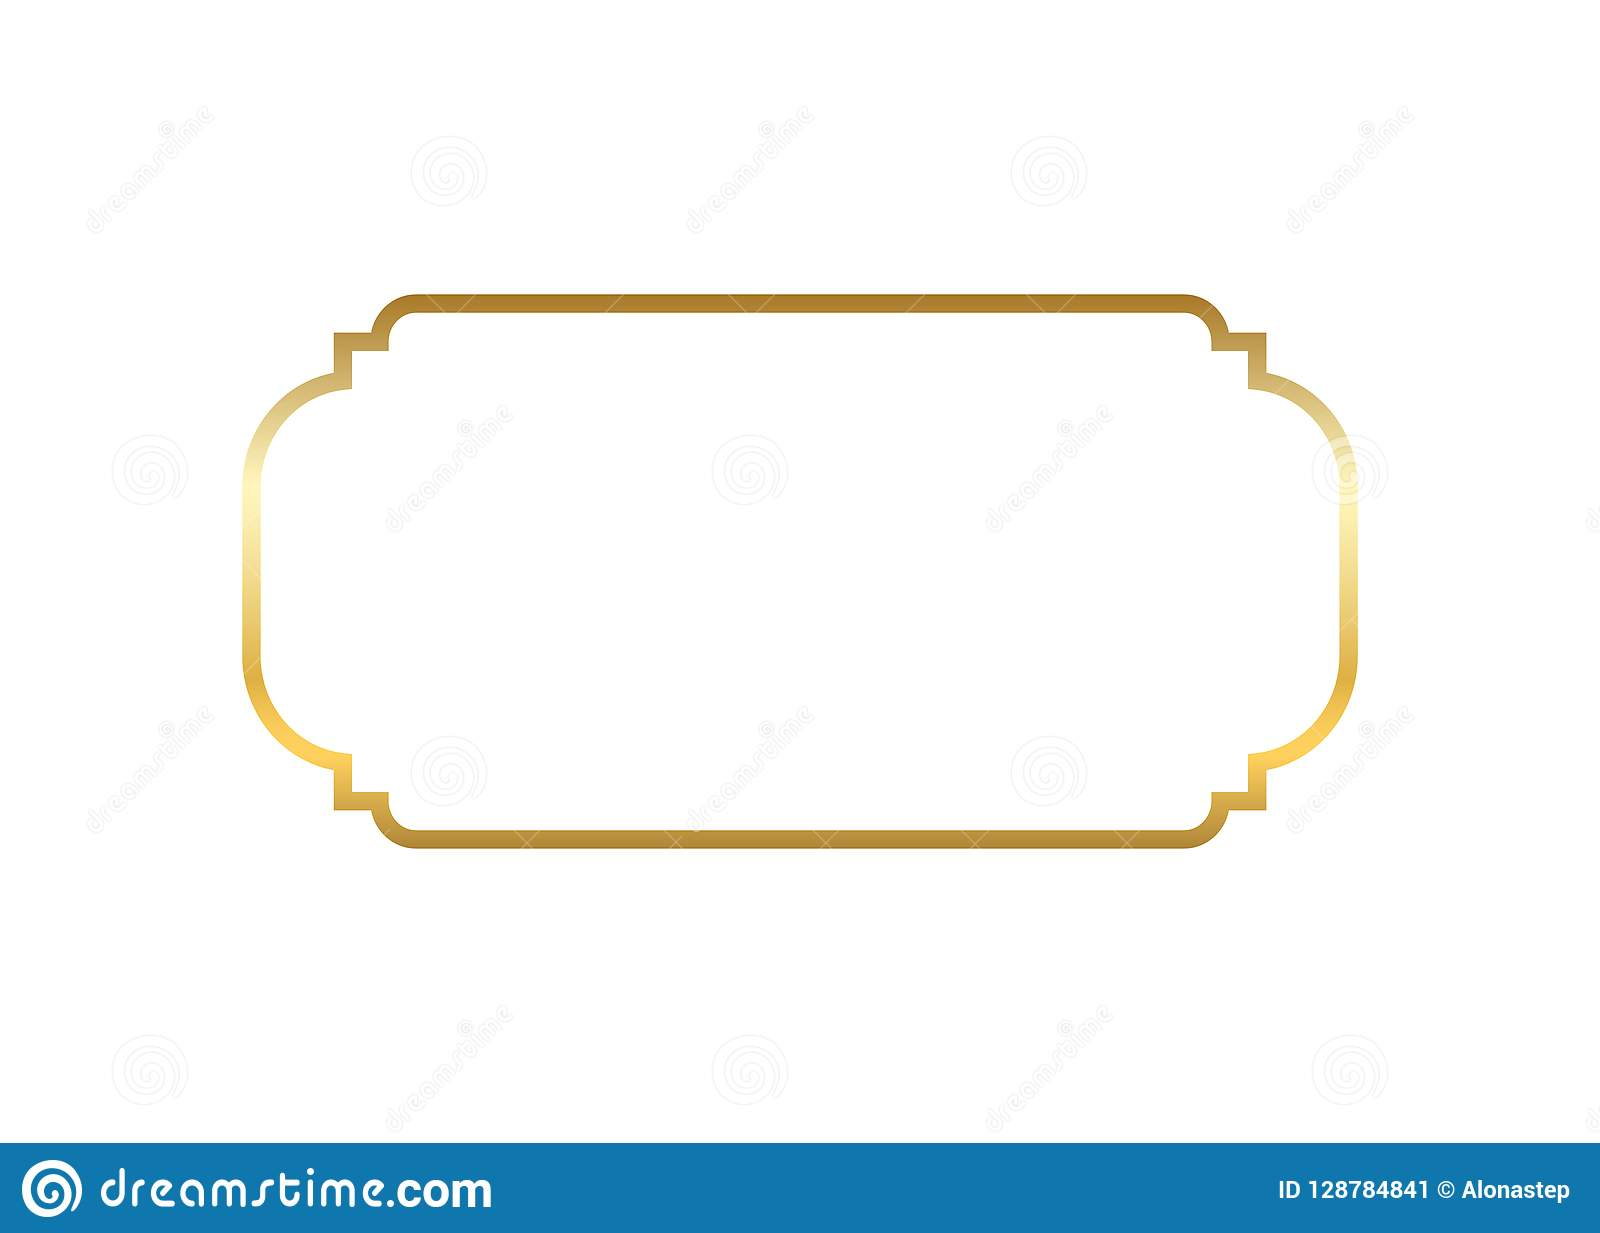 Gold Frame  Beautiful Simple Golden Design  Vintage Style